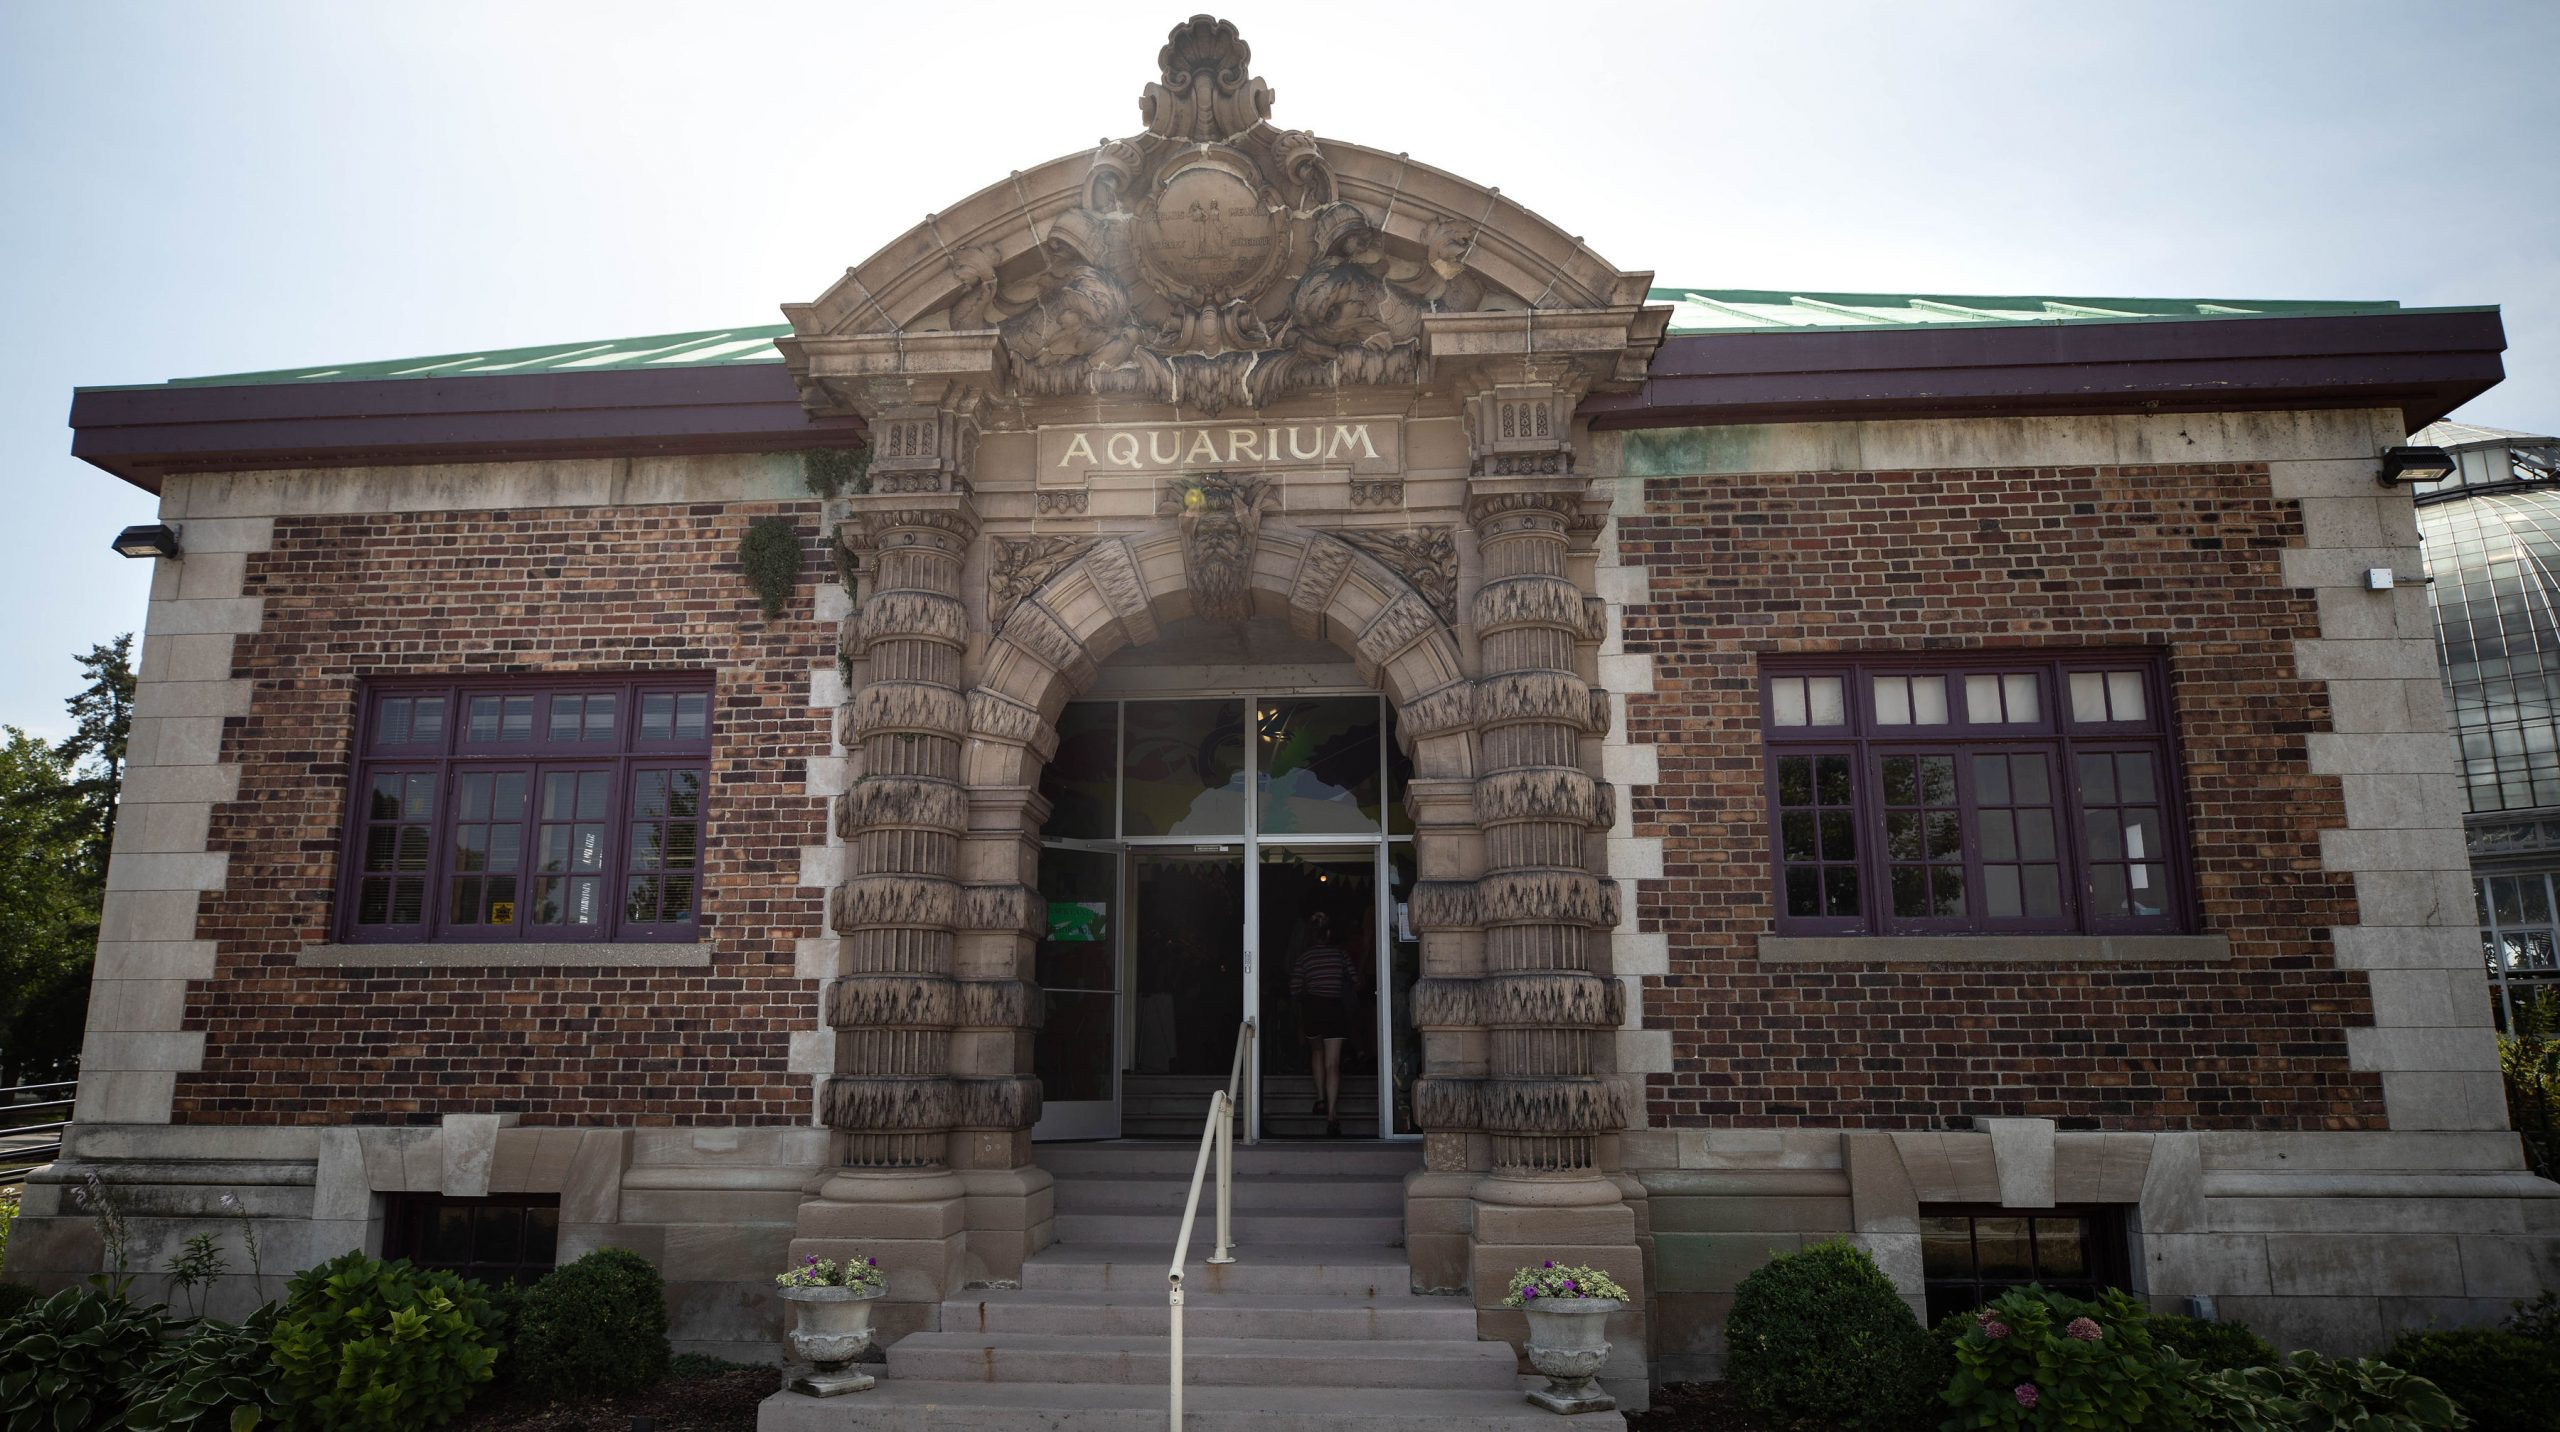 Belle Isle Aquarium in Detroit Michigan by Annie Fairfax